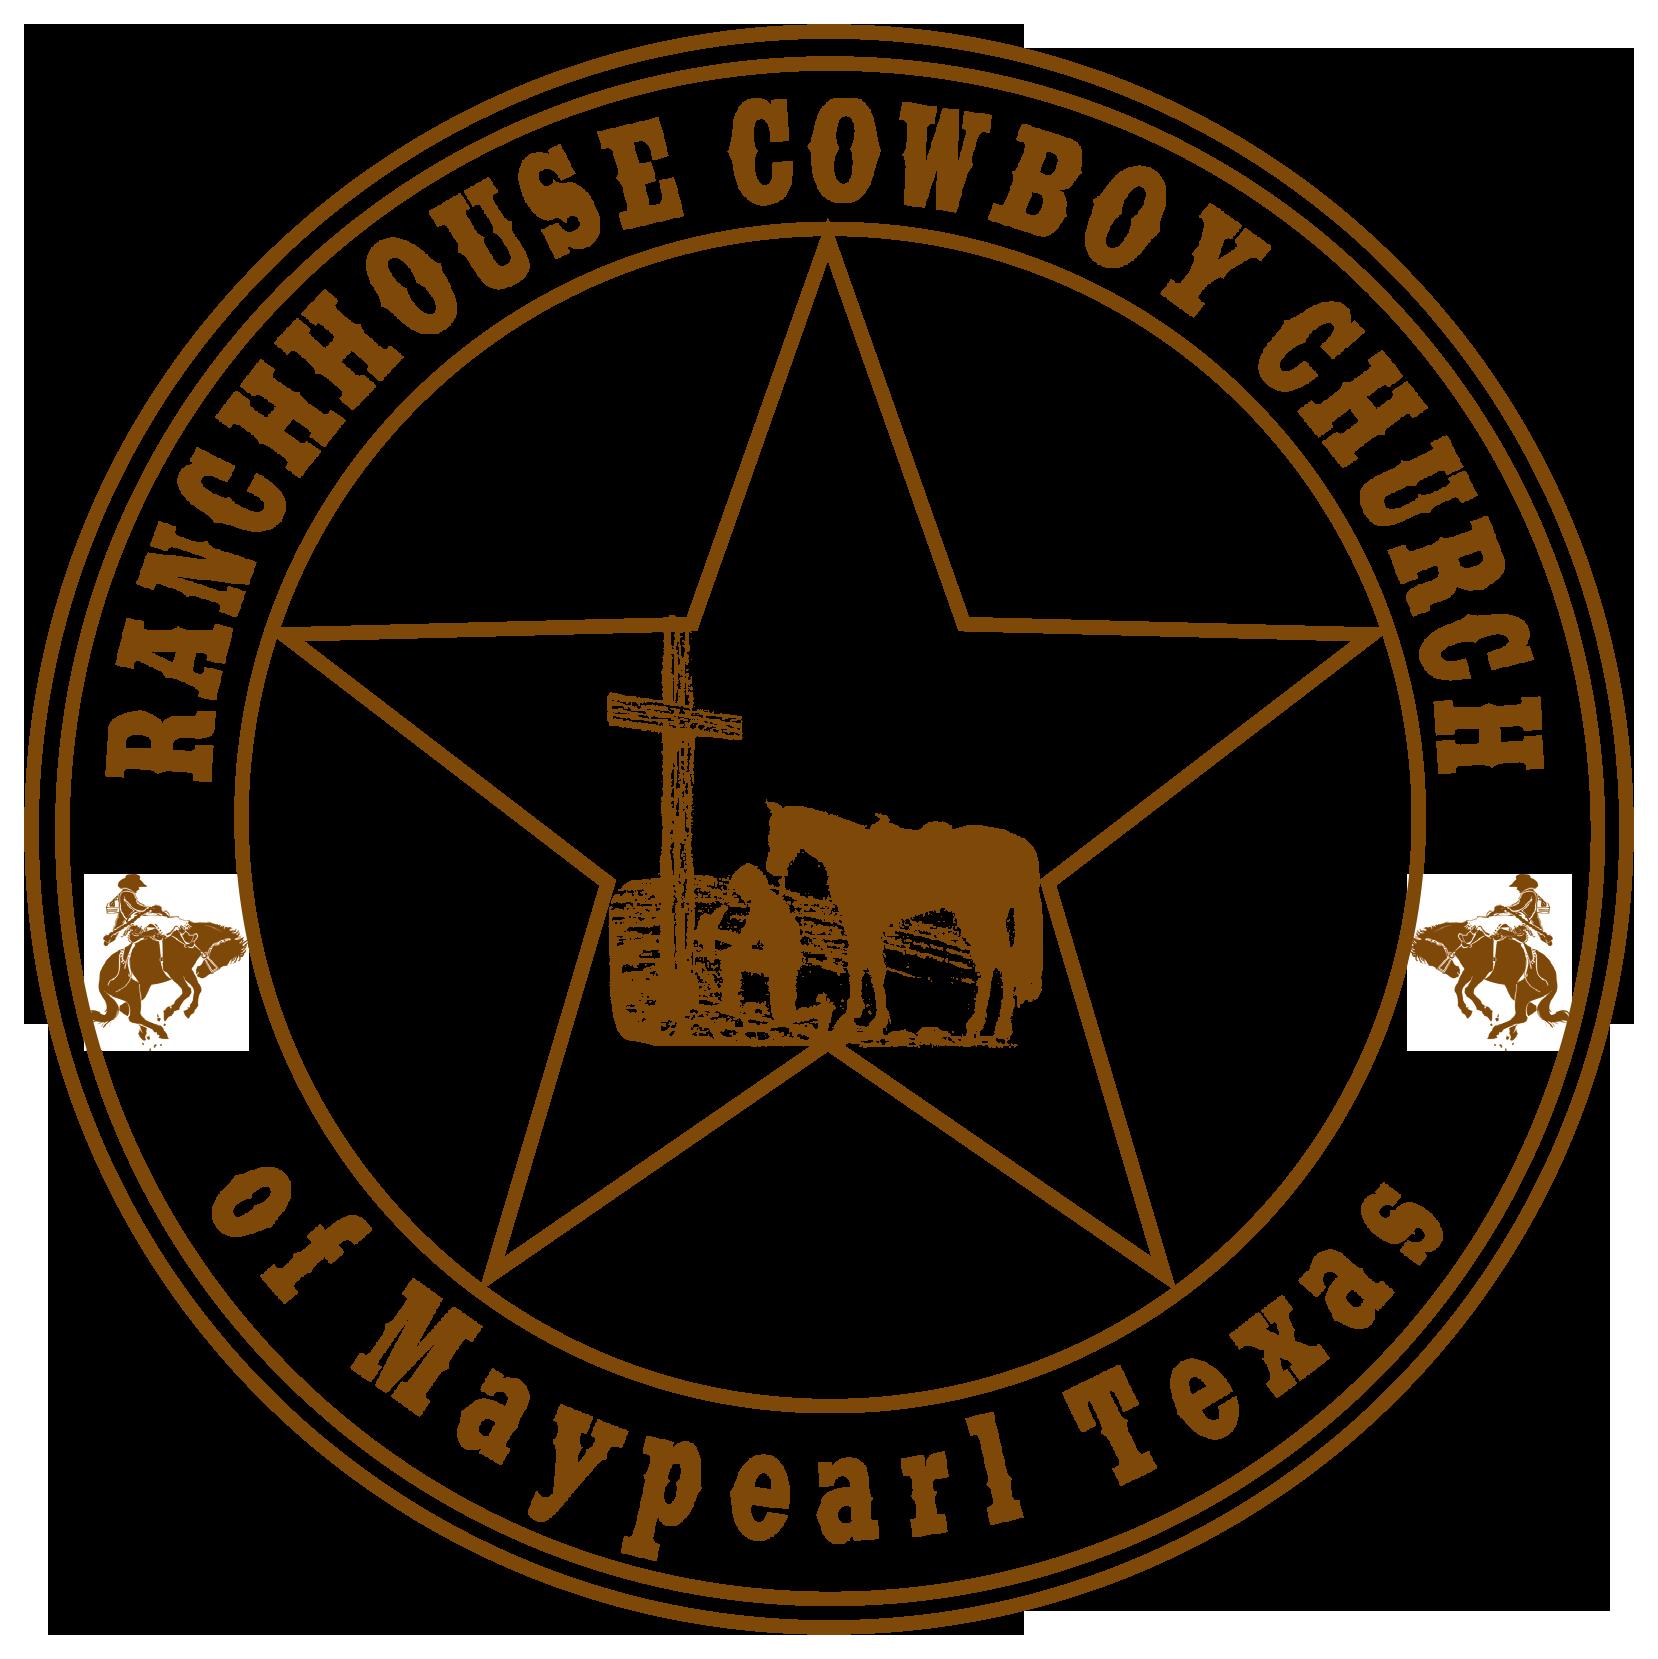 Ranchhouse Cowboy Church - Maypearl